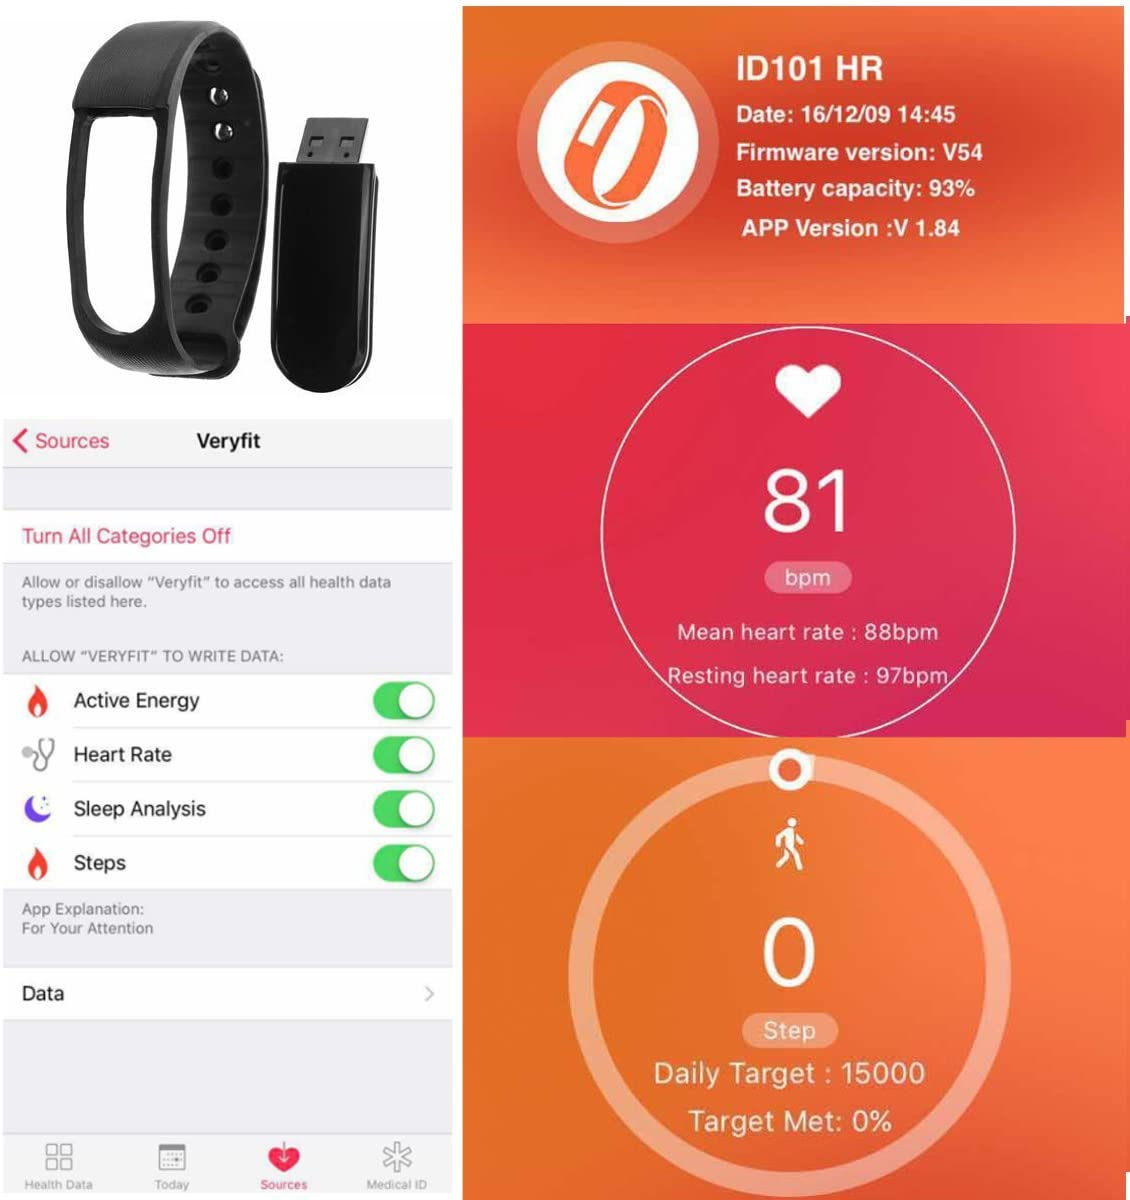 Fitness Heart Rate Tracker,CAMTOA ID101HR Wireless Fitness Monitor ...